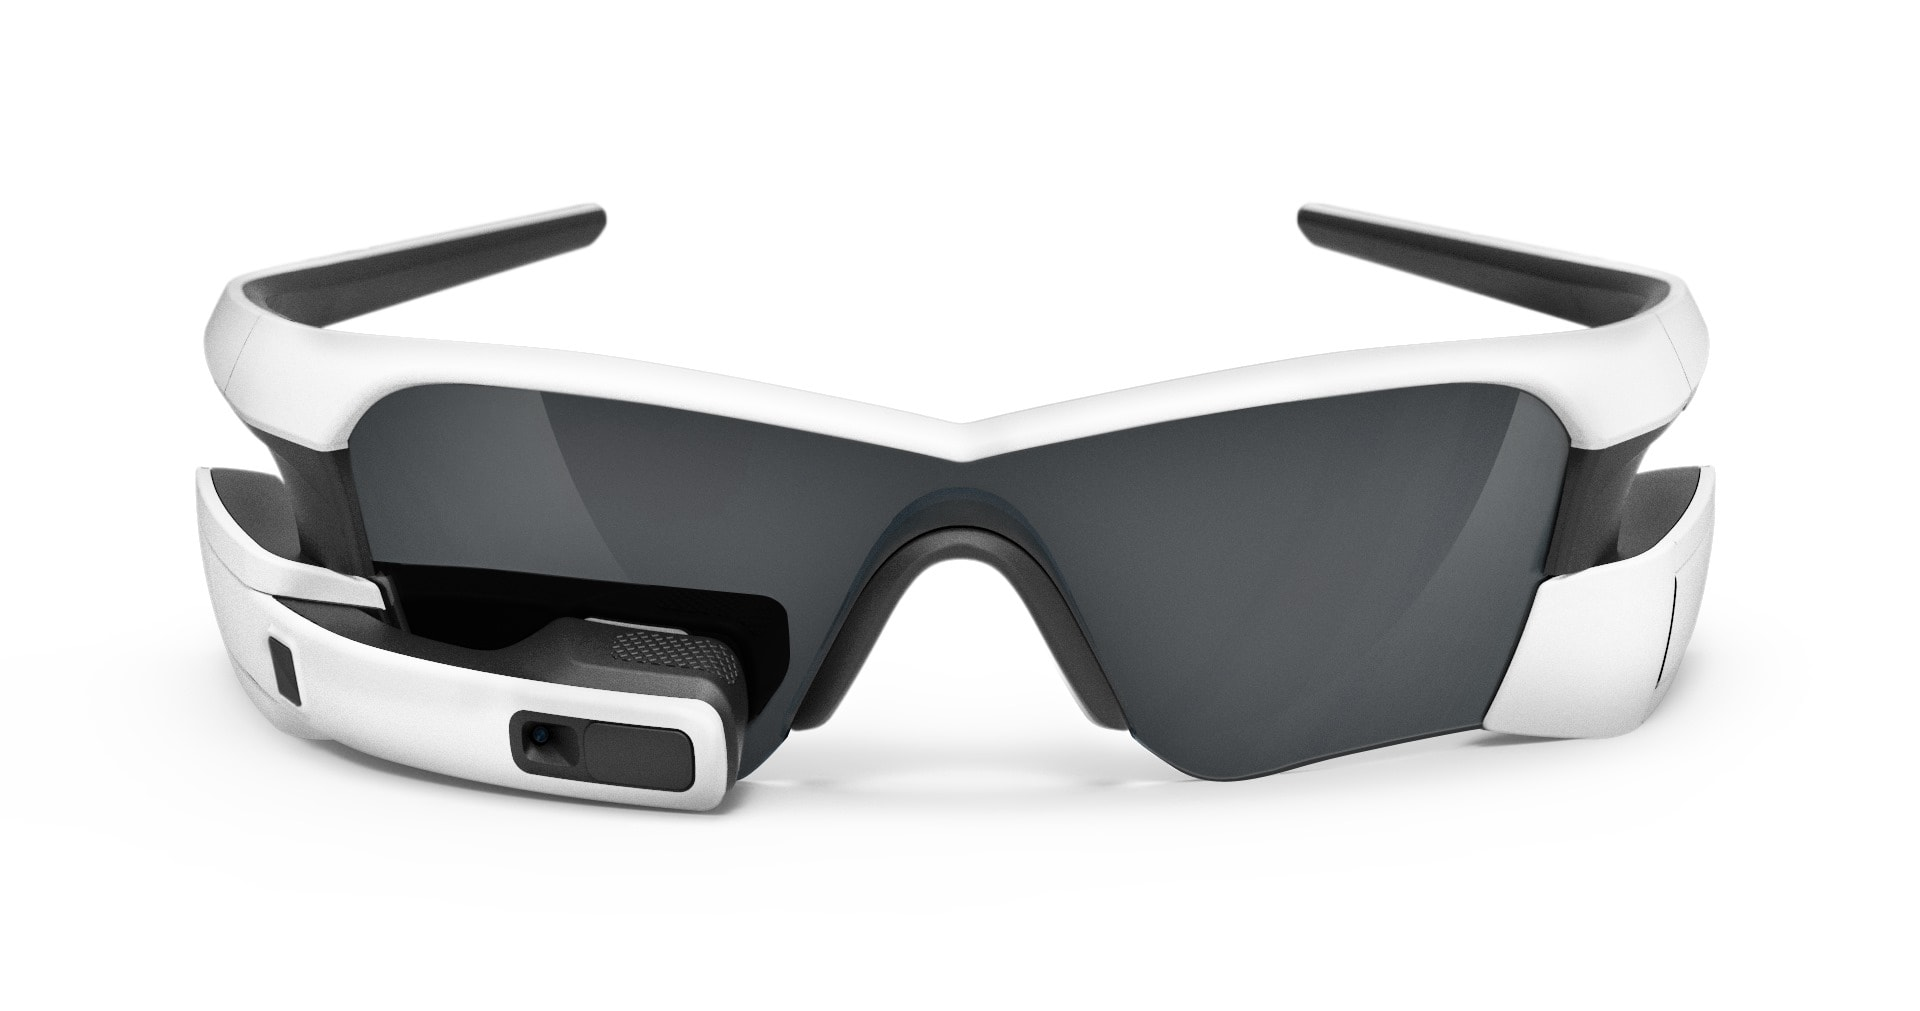 Очки со встроенным дисплеем Recon Jet для спортсменов